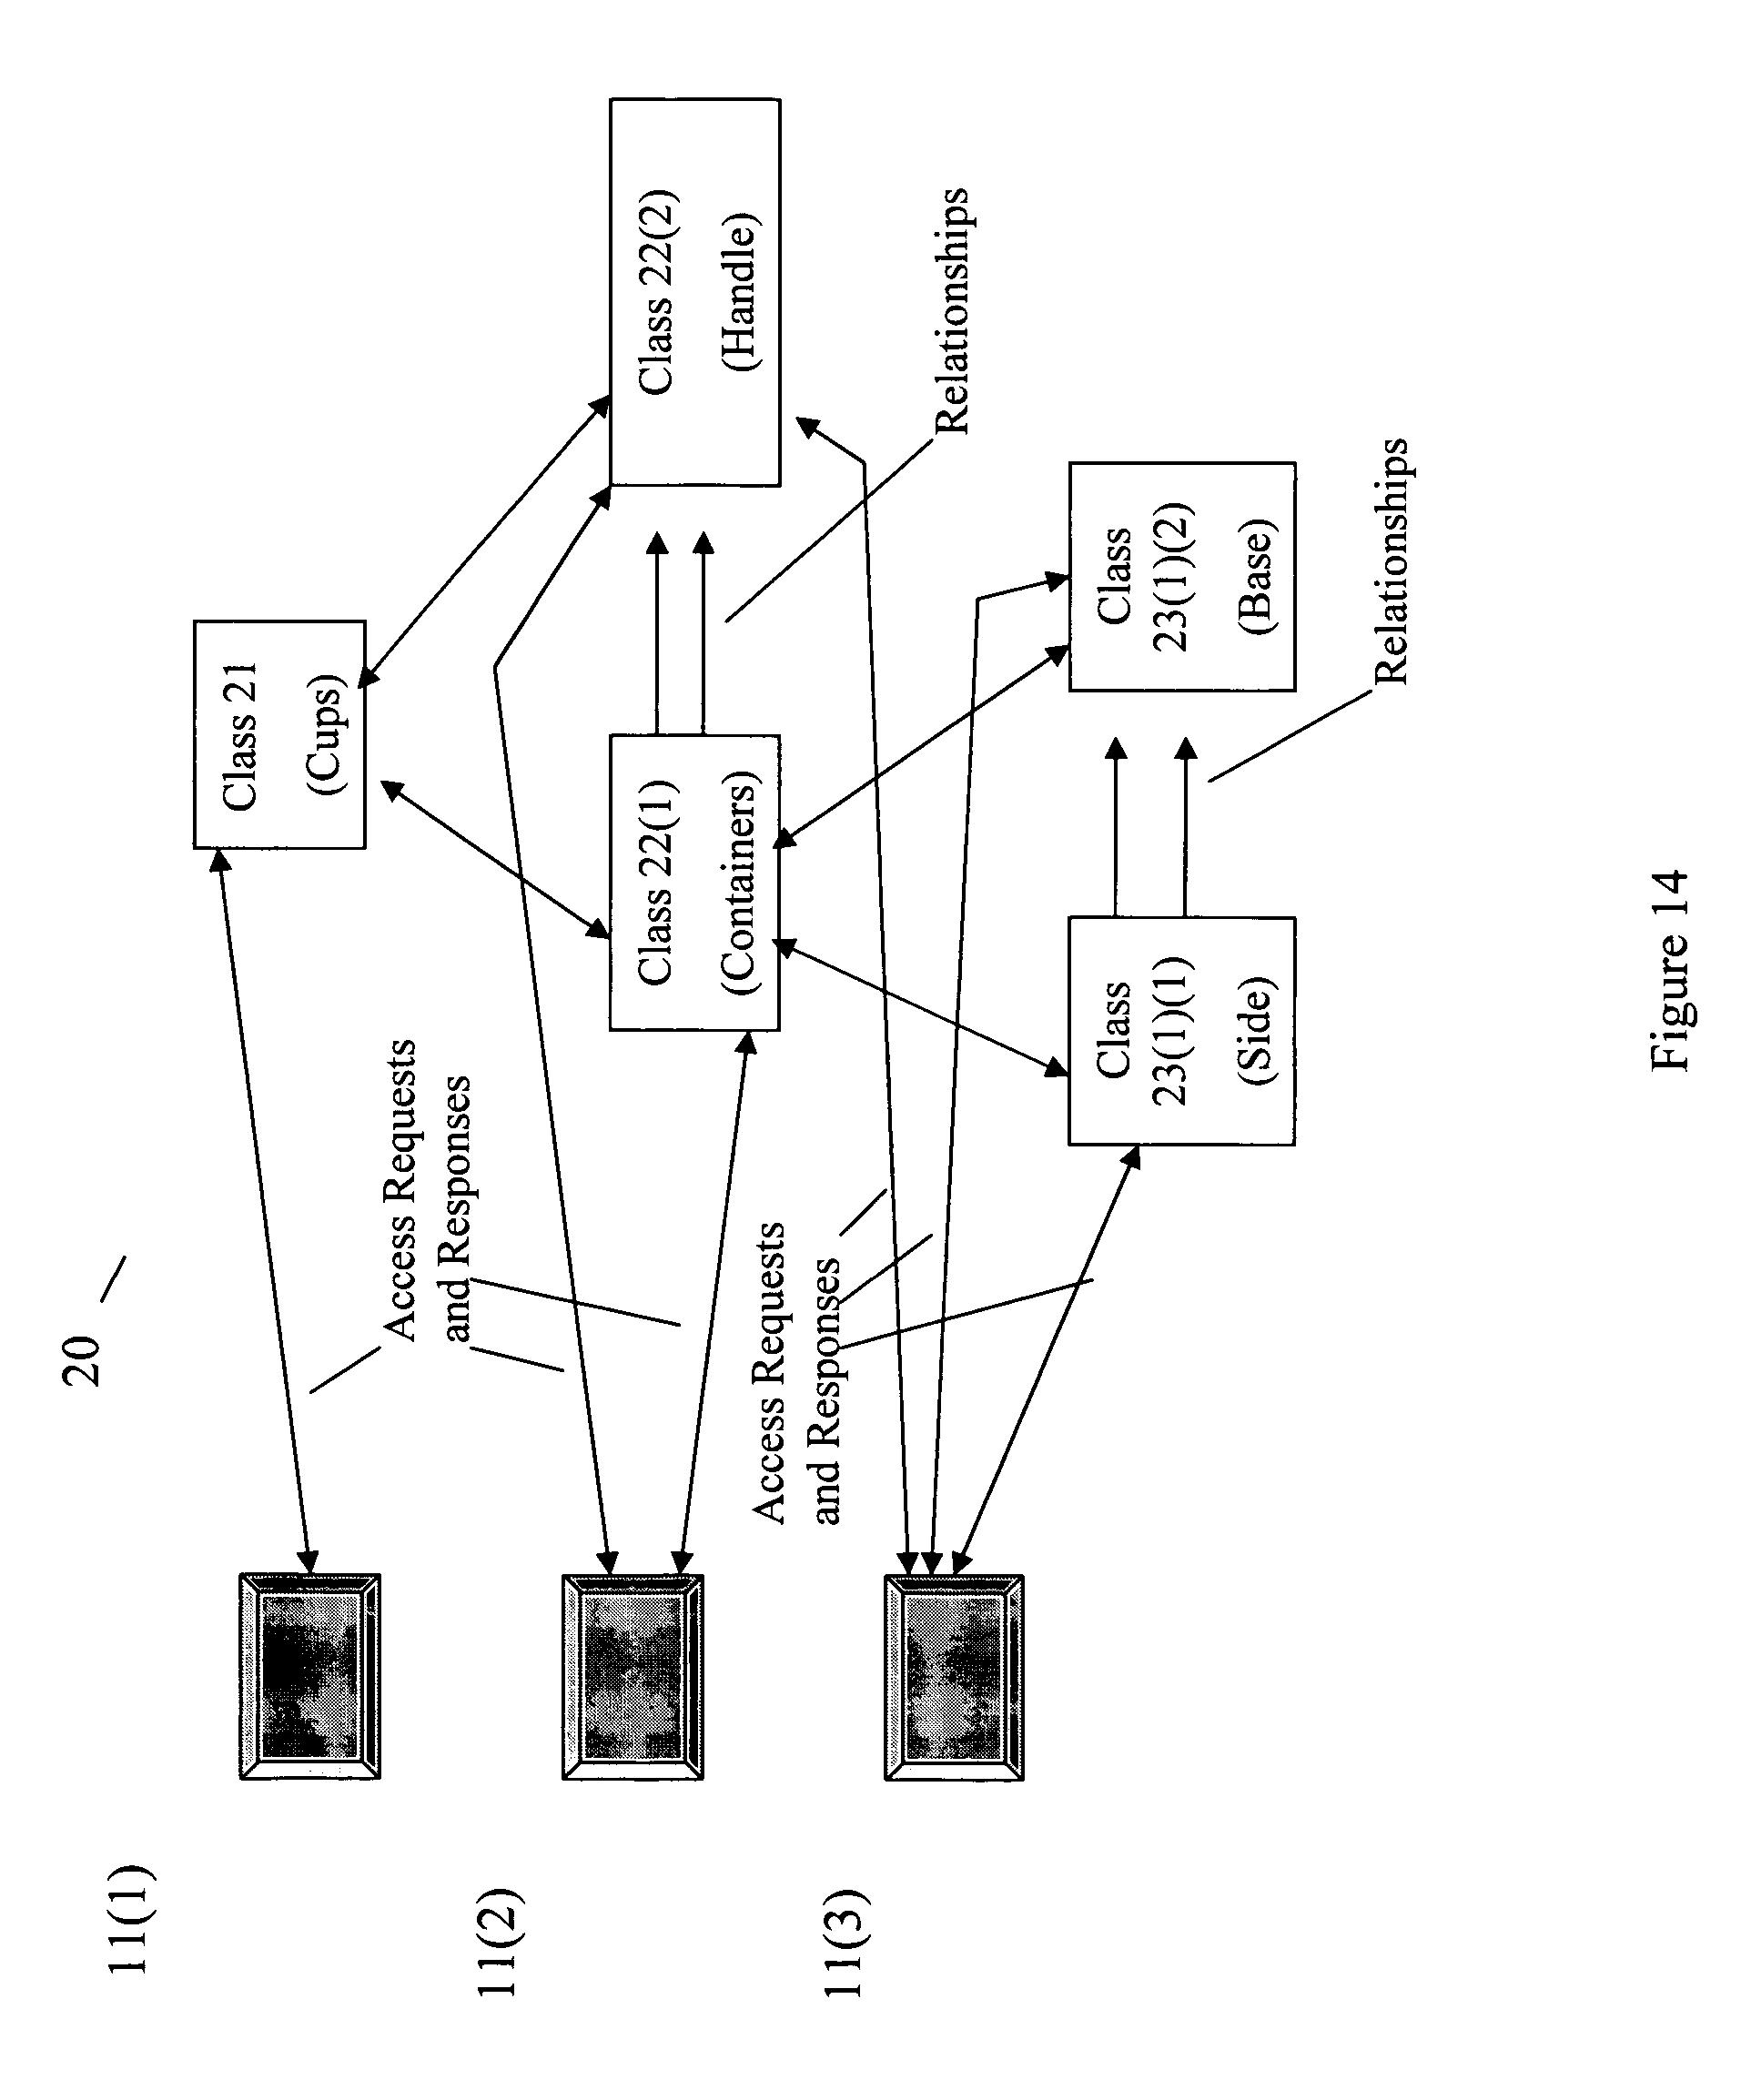 xbox controller wiring diagram wiring diagram database Nintendo 64 Controller Diagram xbox wired controller wiring diagram wiring diagram database solar controller wiring diagram repurpose xbox 360 controller